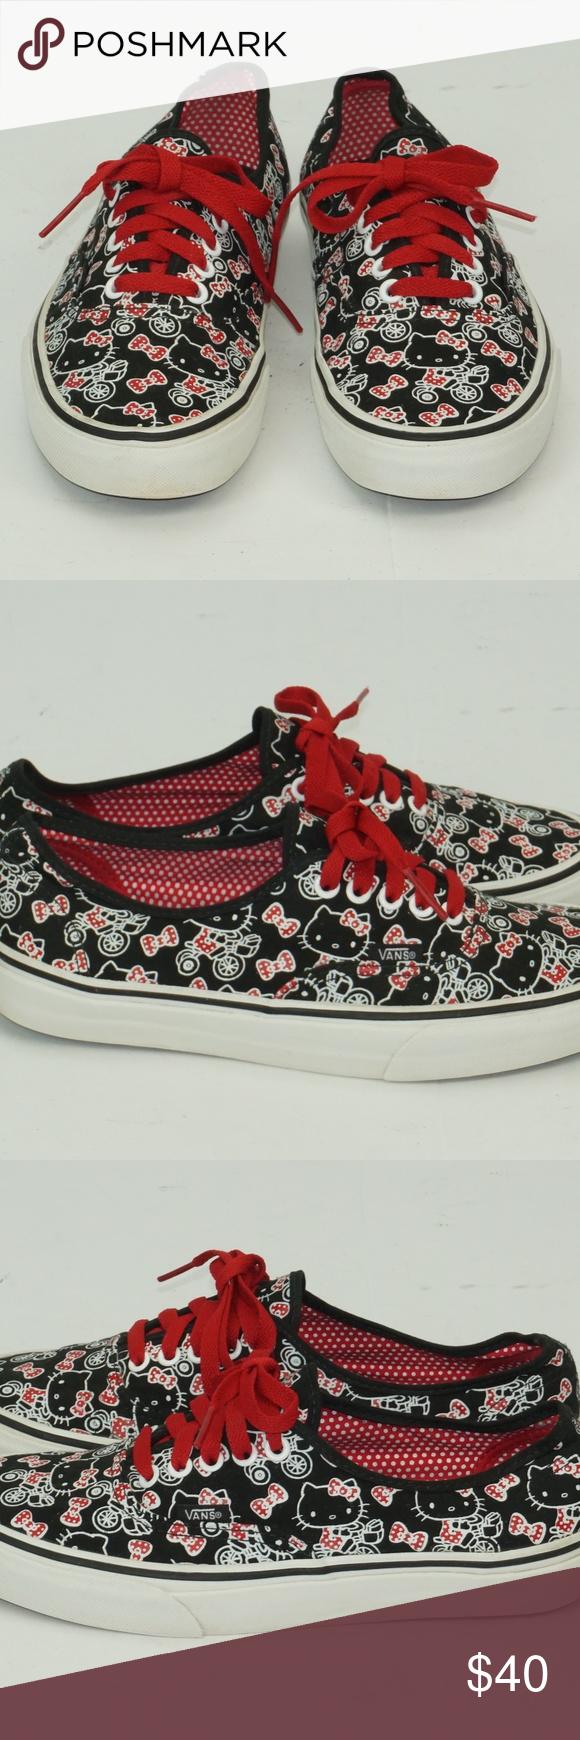 5f68ac613 Vans Hello Kitty Shoes Vans Black Hello Kitty low top Shoes Size Men 7  Women 8.5 Vans Shoes Athletic Shoes